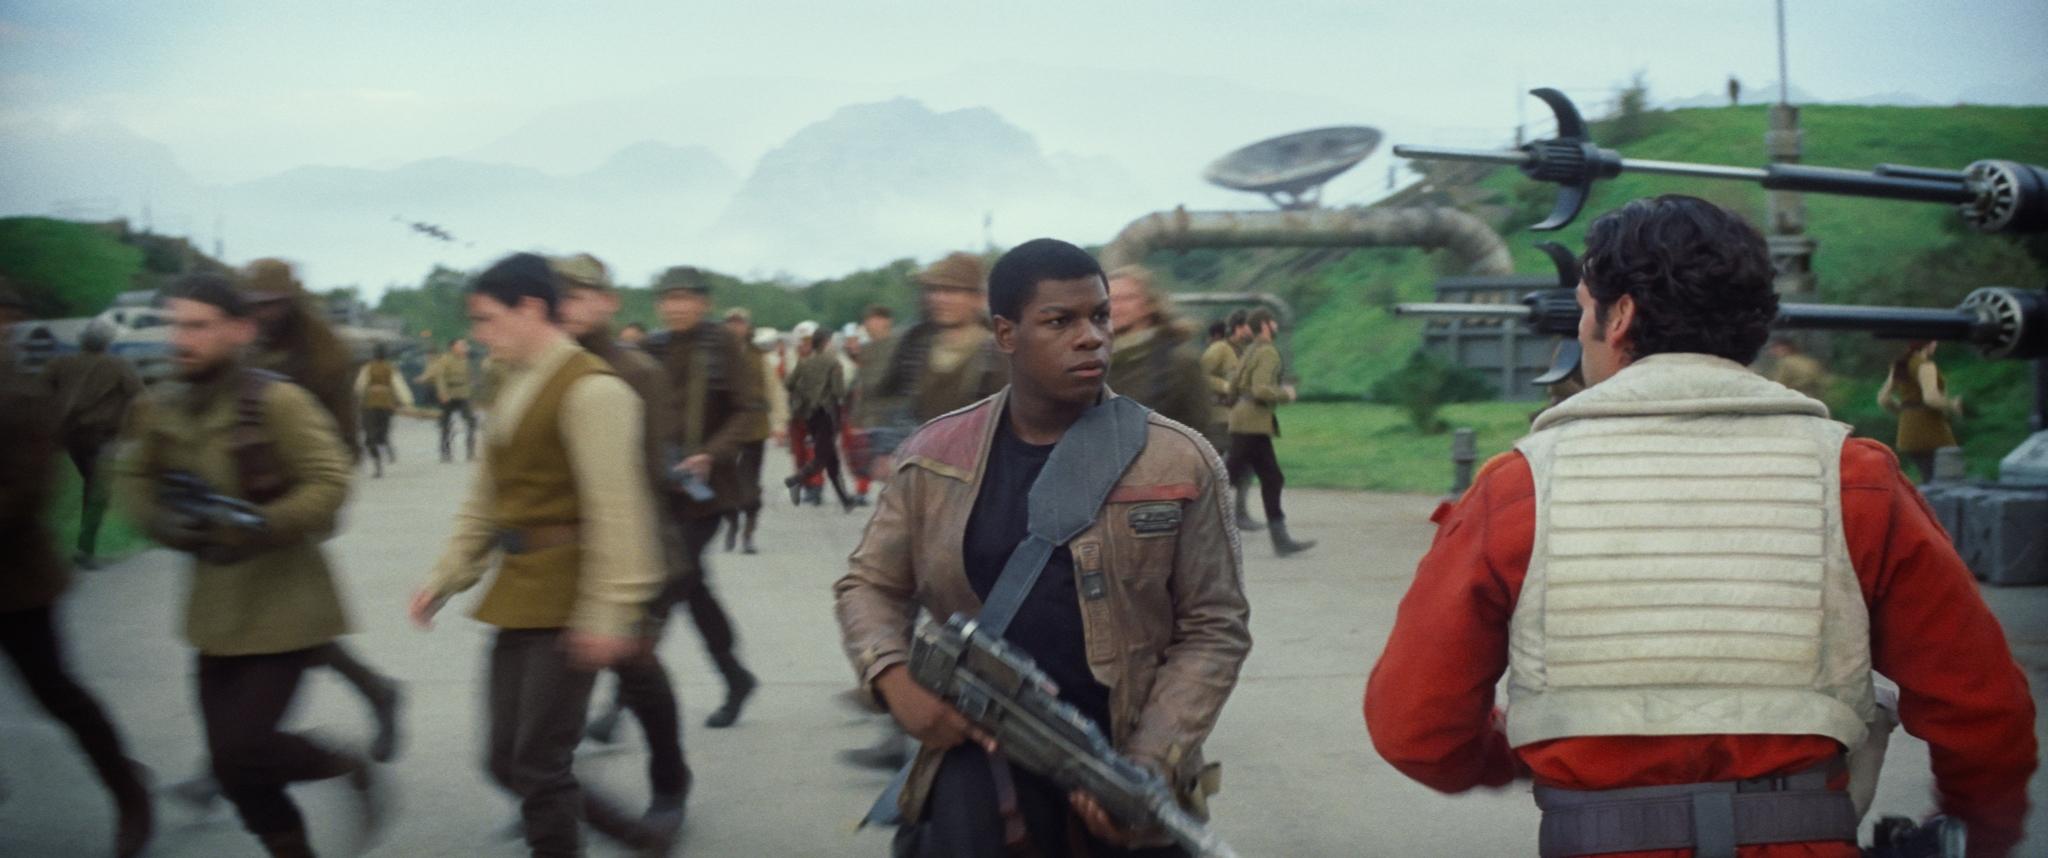 Star Wars: Síla se probouzí